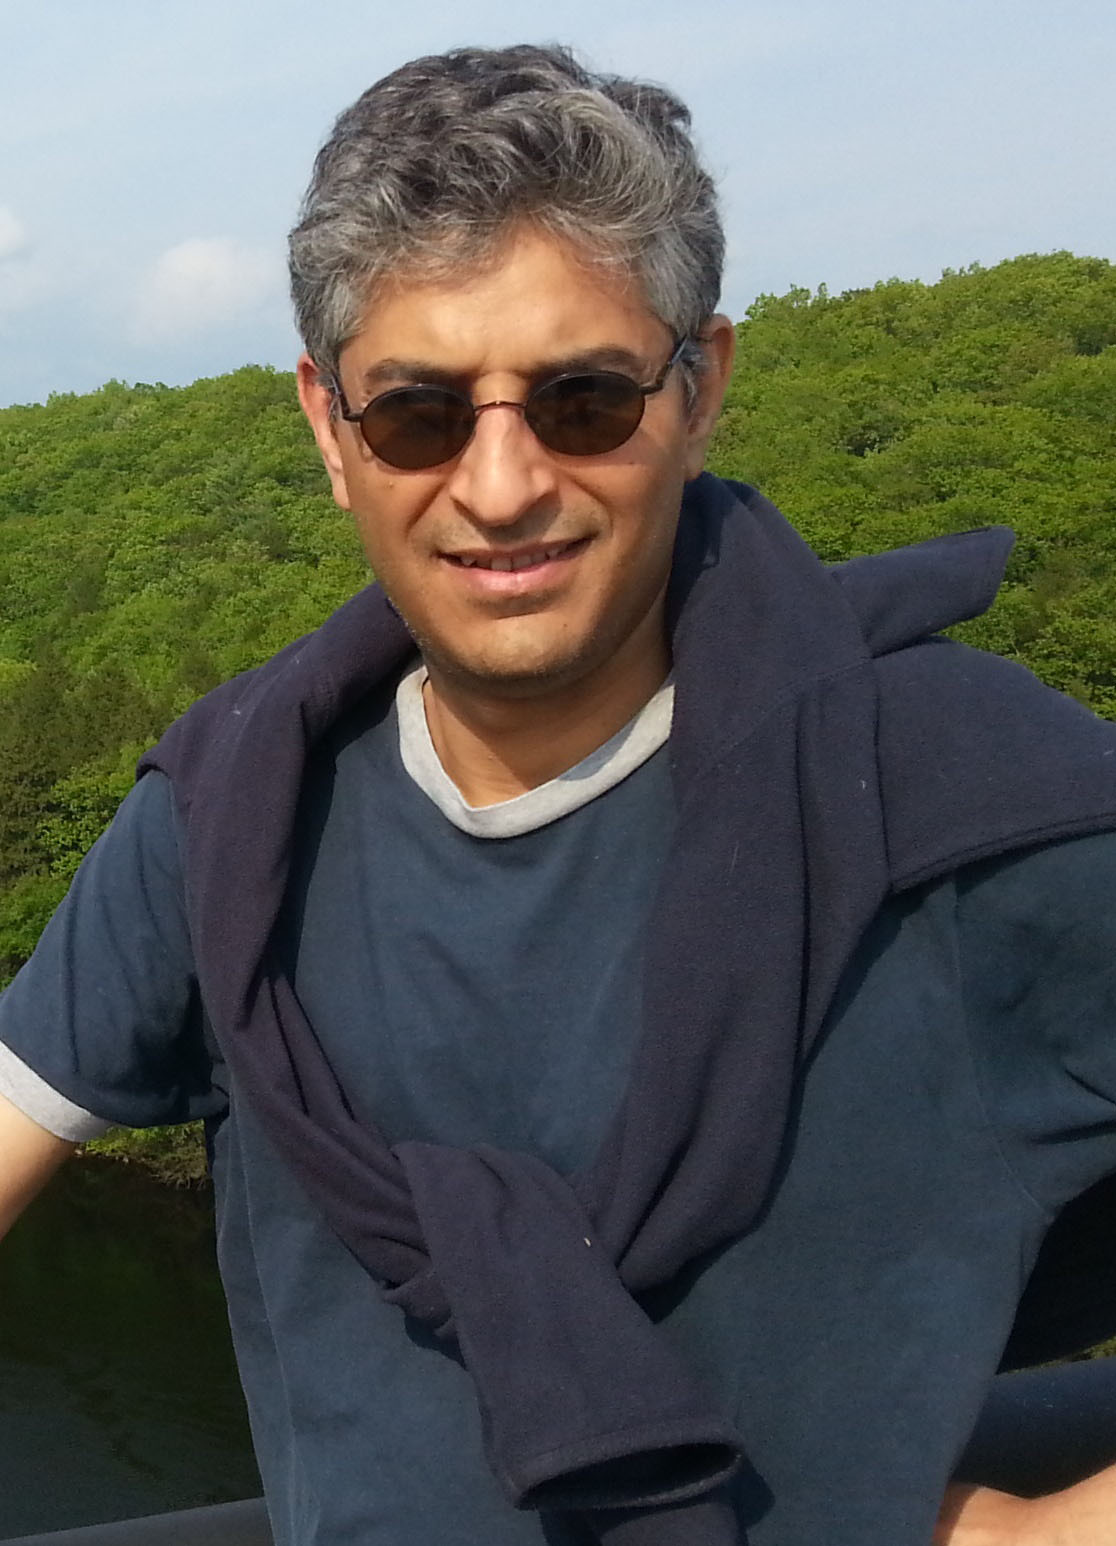 Farasat Bokhari